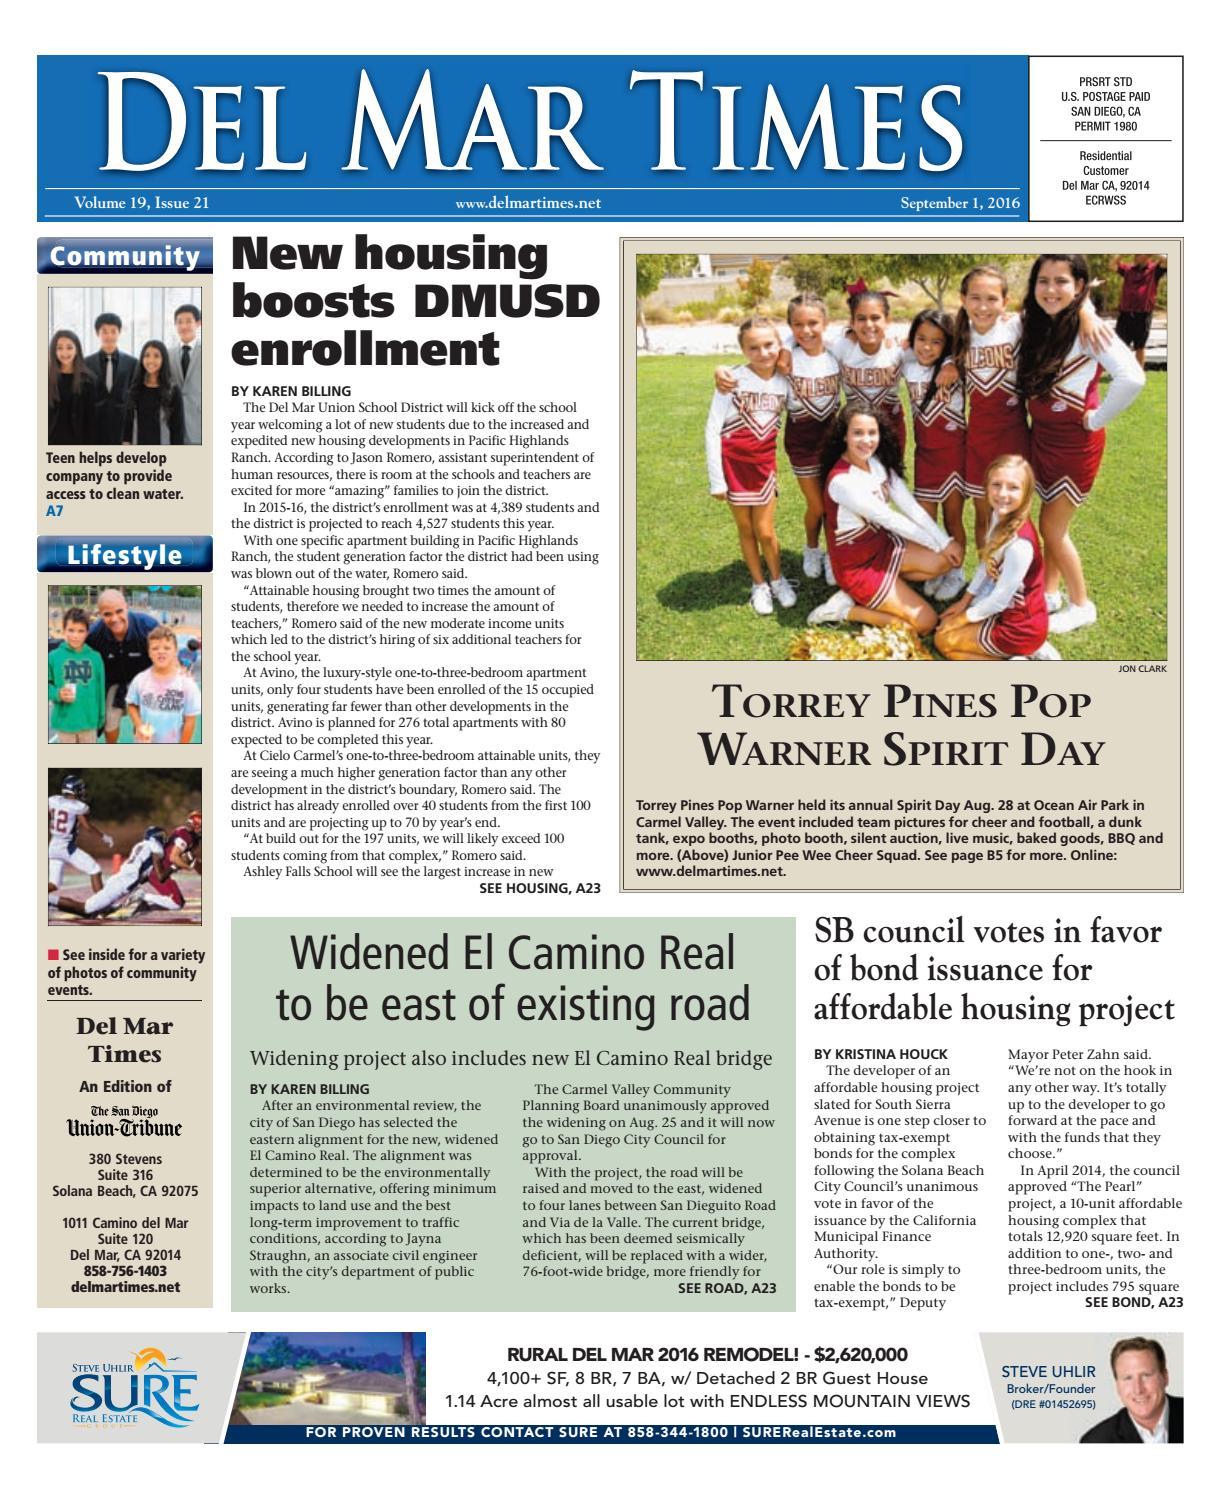 Del Mar Times 09 01 16 By MainStreet Media